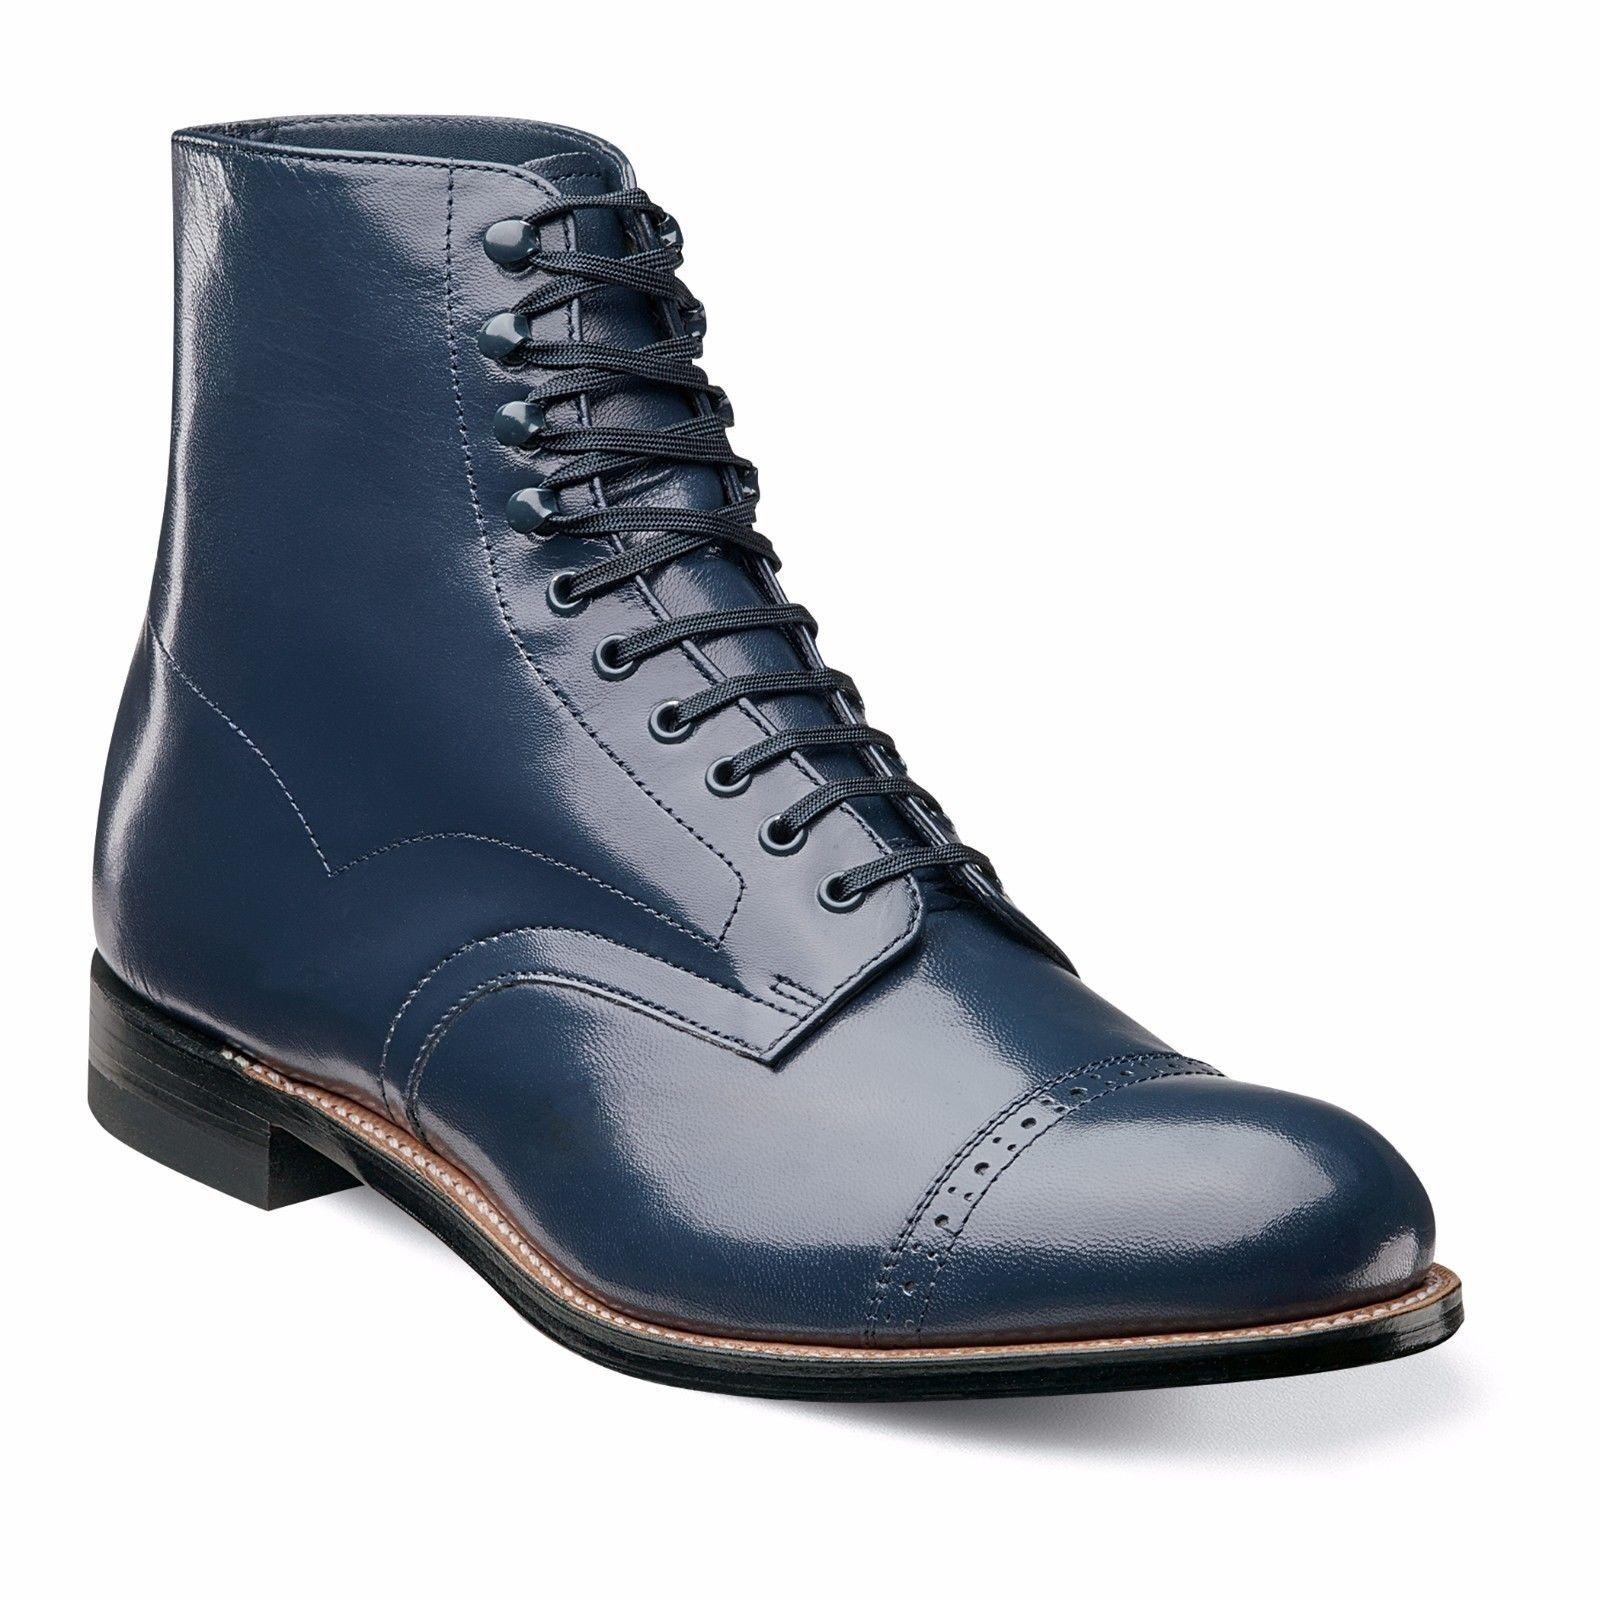 Stacy Adams Uomo Madison Navy Pelle Trending Dress Trending Pelle Ankle Medium Wide Boot 3367ef